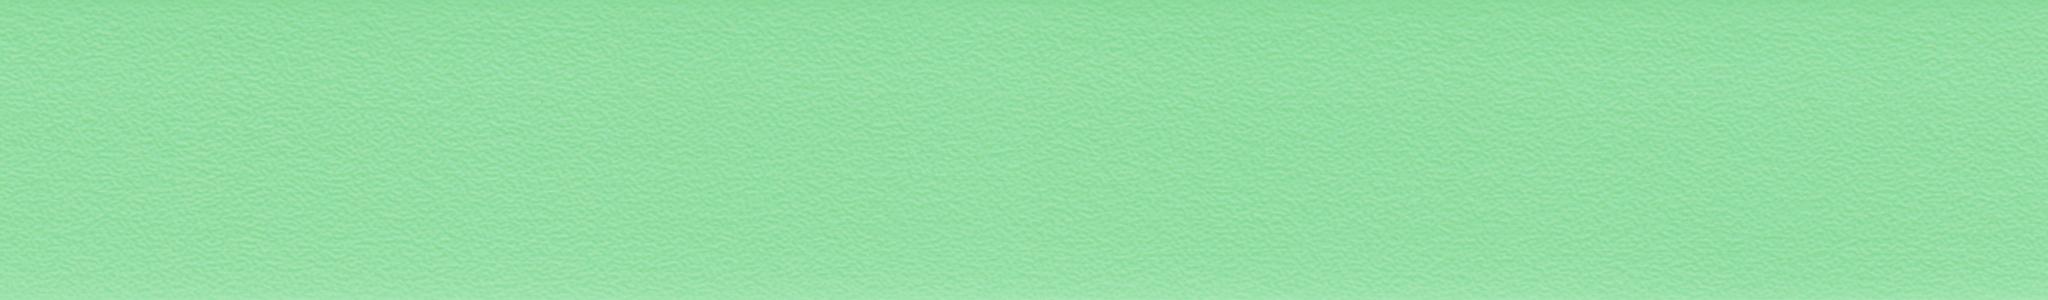 HU 16622 ABS hrana zelená perla 101